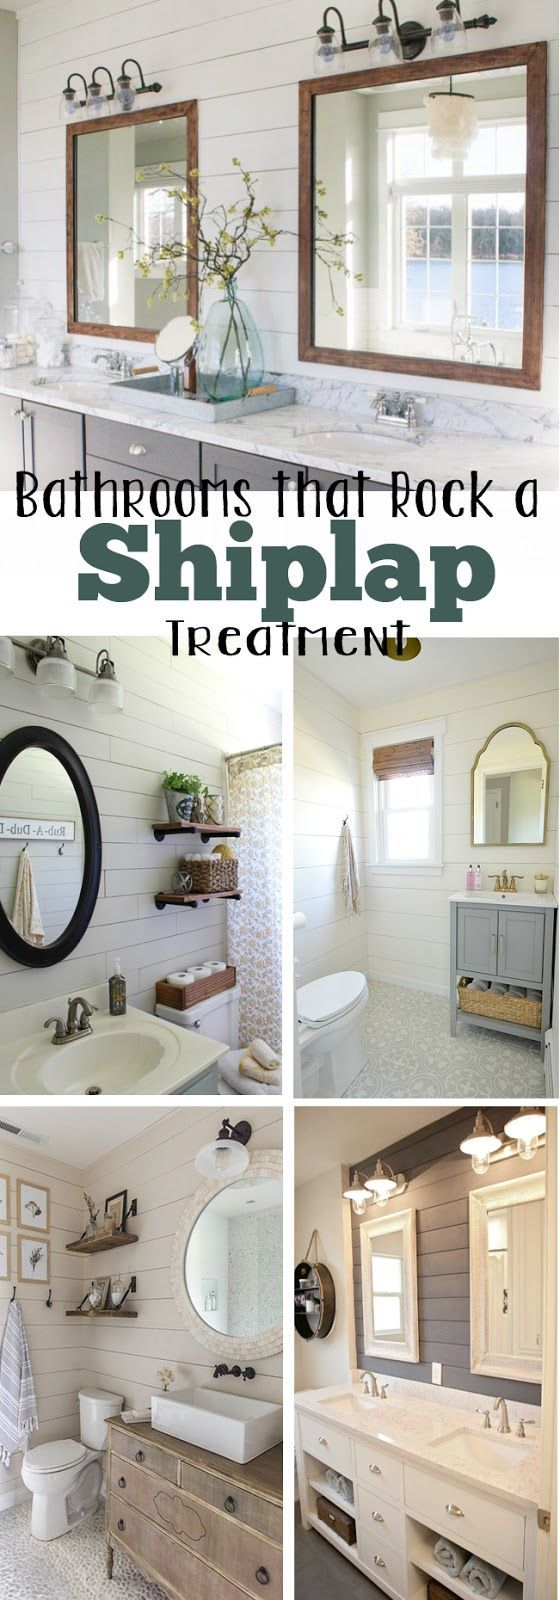 81 best bath images on pinterest room bathroom ideas and home 10 bathrooms that rock a shiplap treatment